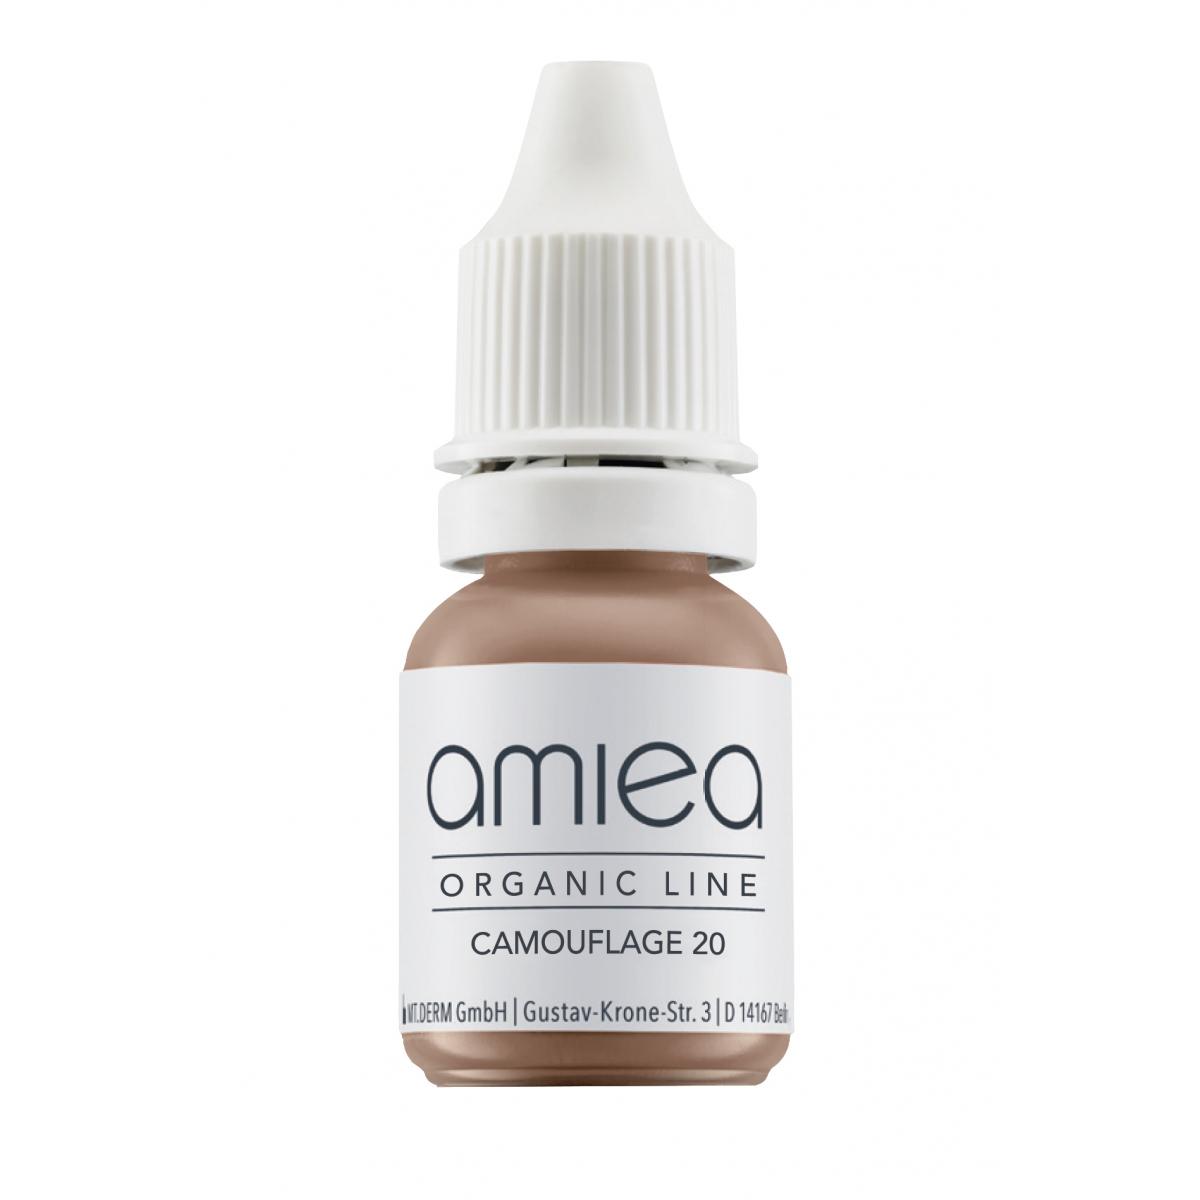 Organicline (10 ml) - PIGMENTS AMIEA ORGANICLINE CAMOUFLAGE 20, Flacon 10 ml